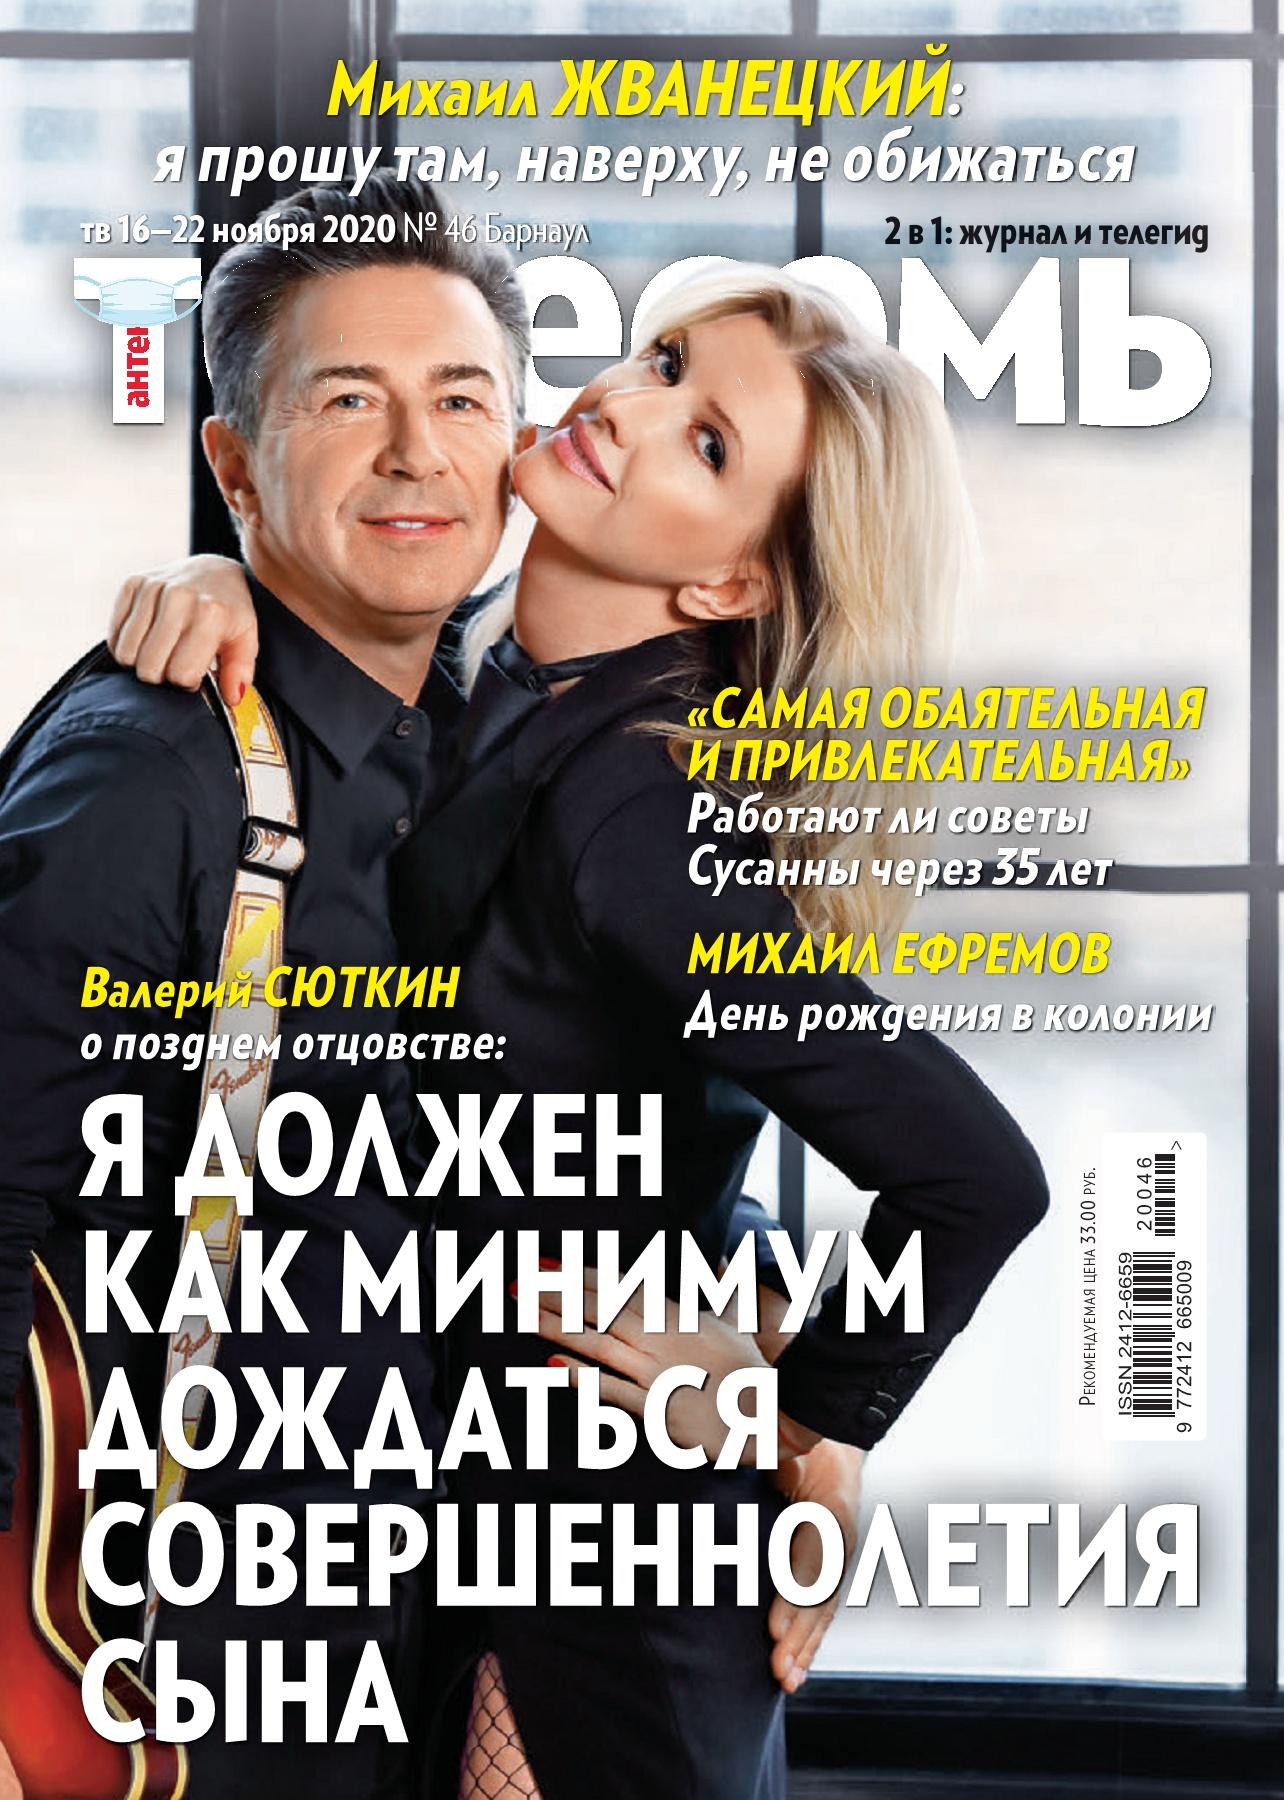 Антенна - Телесемь №46, ноябрь 2020